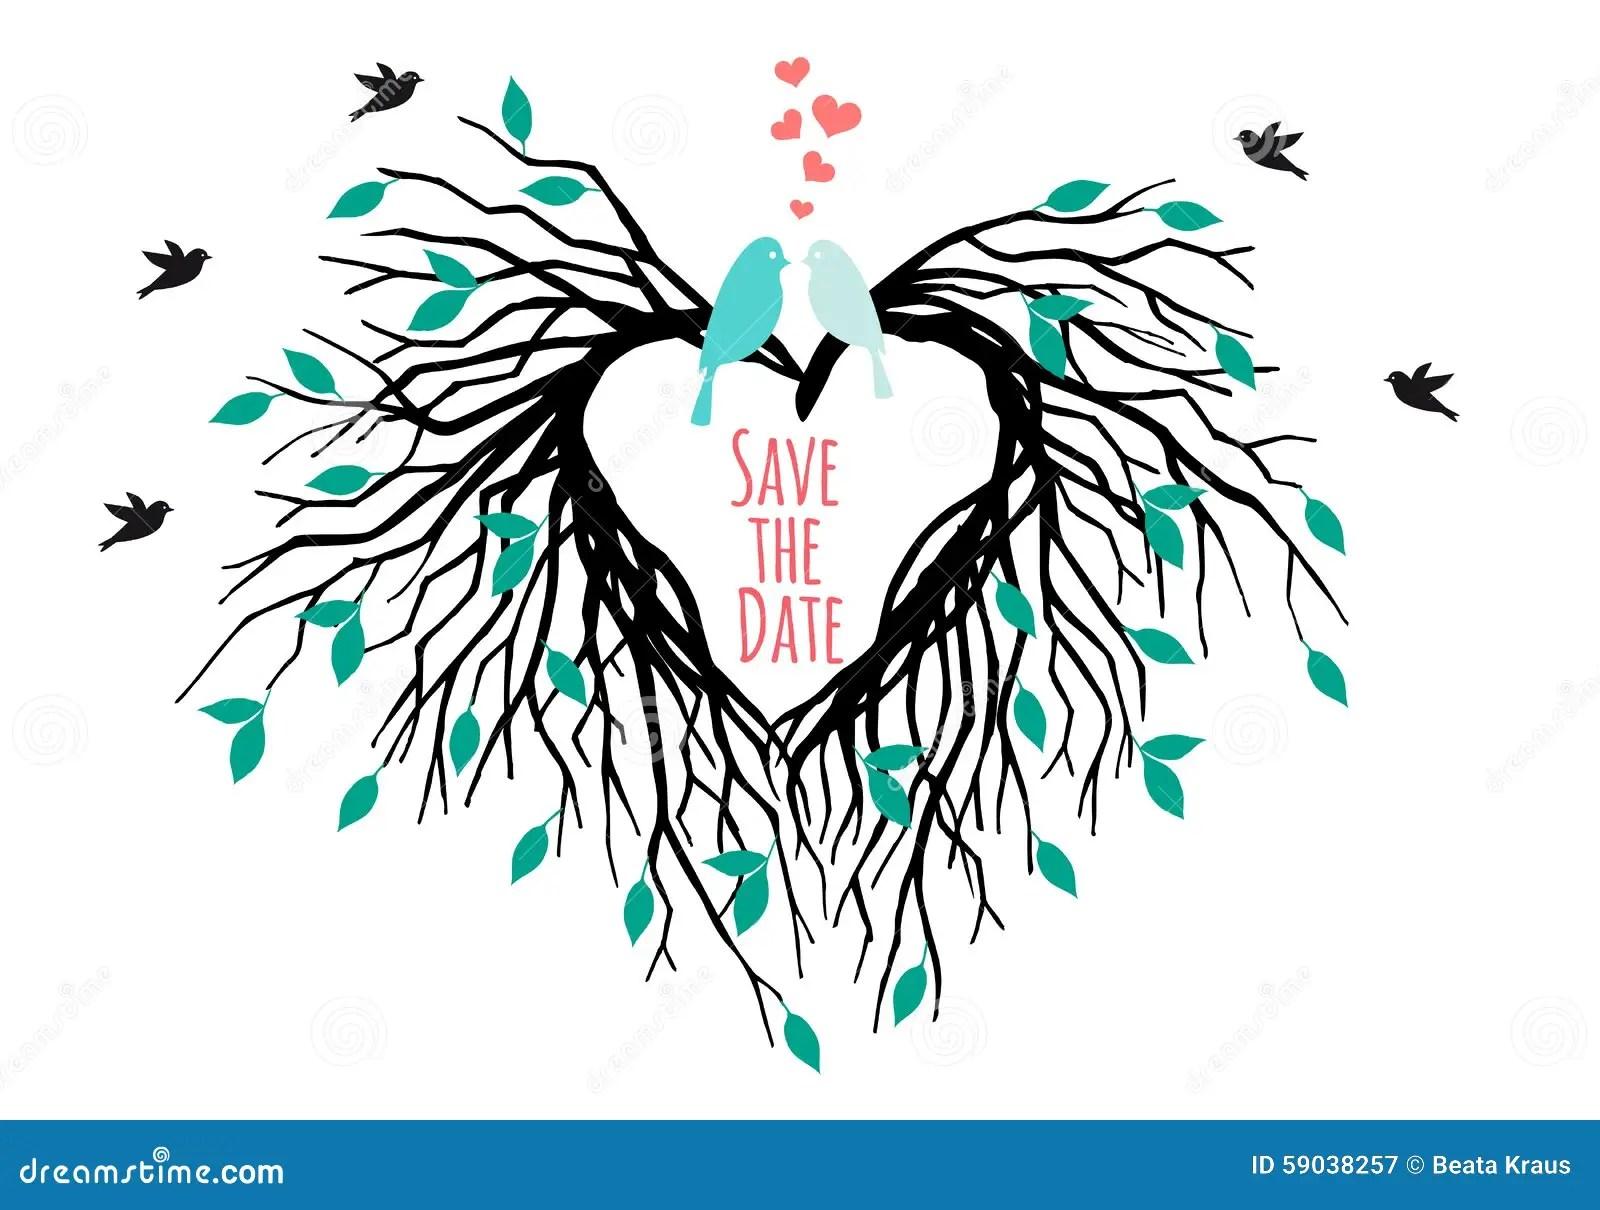 stock illustration heart wedding tree birds vector shaped save date illustration image wedding tree Heart wedding tree with birds vector